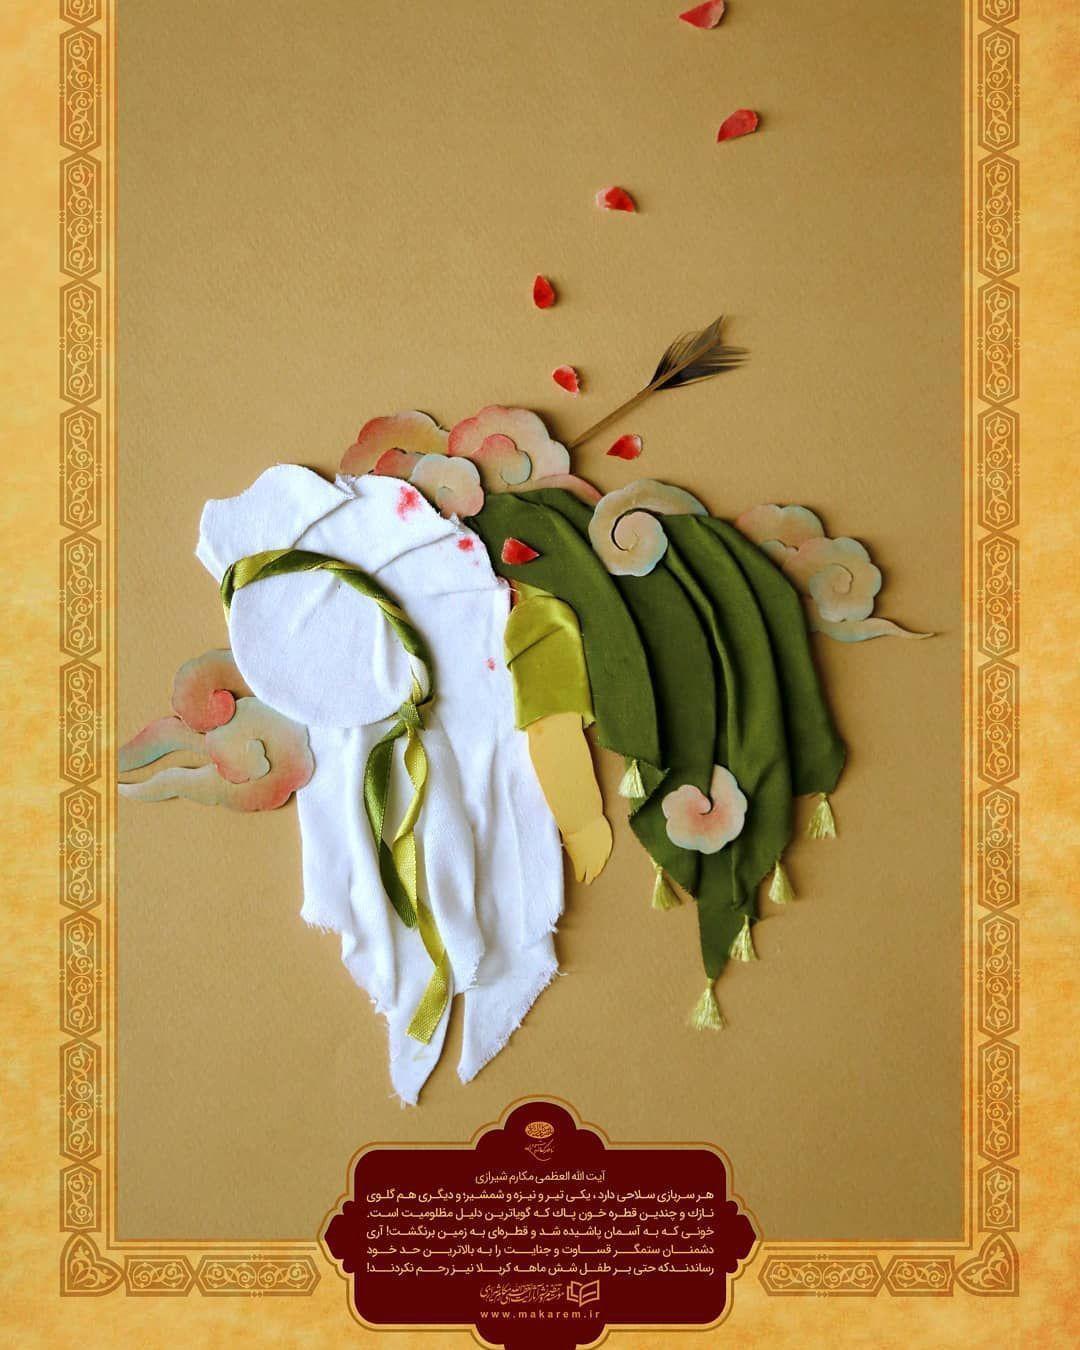 Pin By Irum Batool On Karbala In 2020 Islamic Art Calligraphy Islamic Wall Art Islamic Paintings